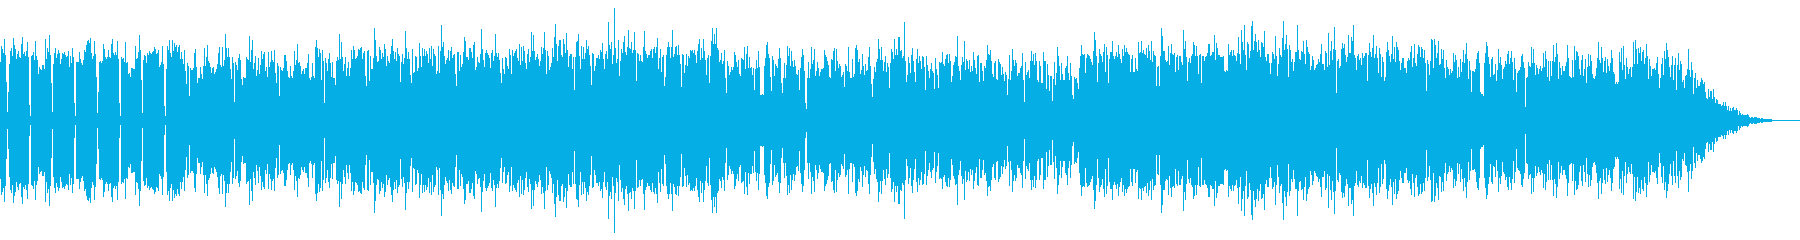 YouTuber用ファミコン風BGM1の再生済みの波形